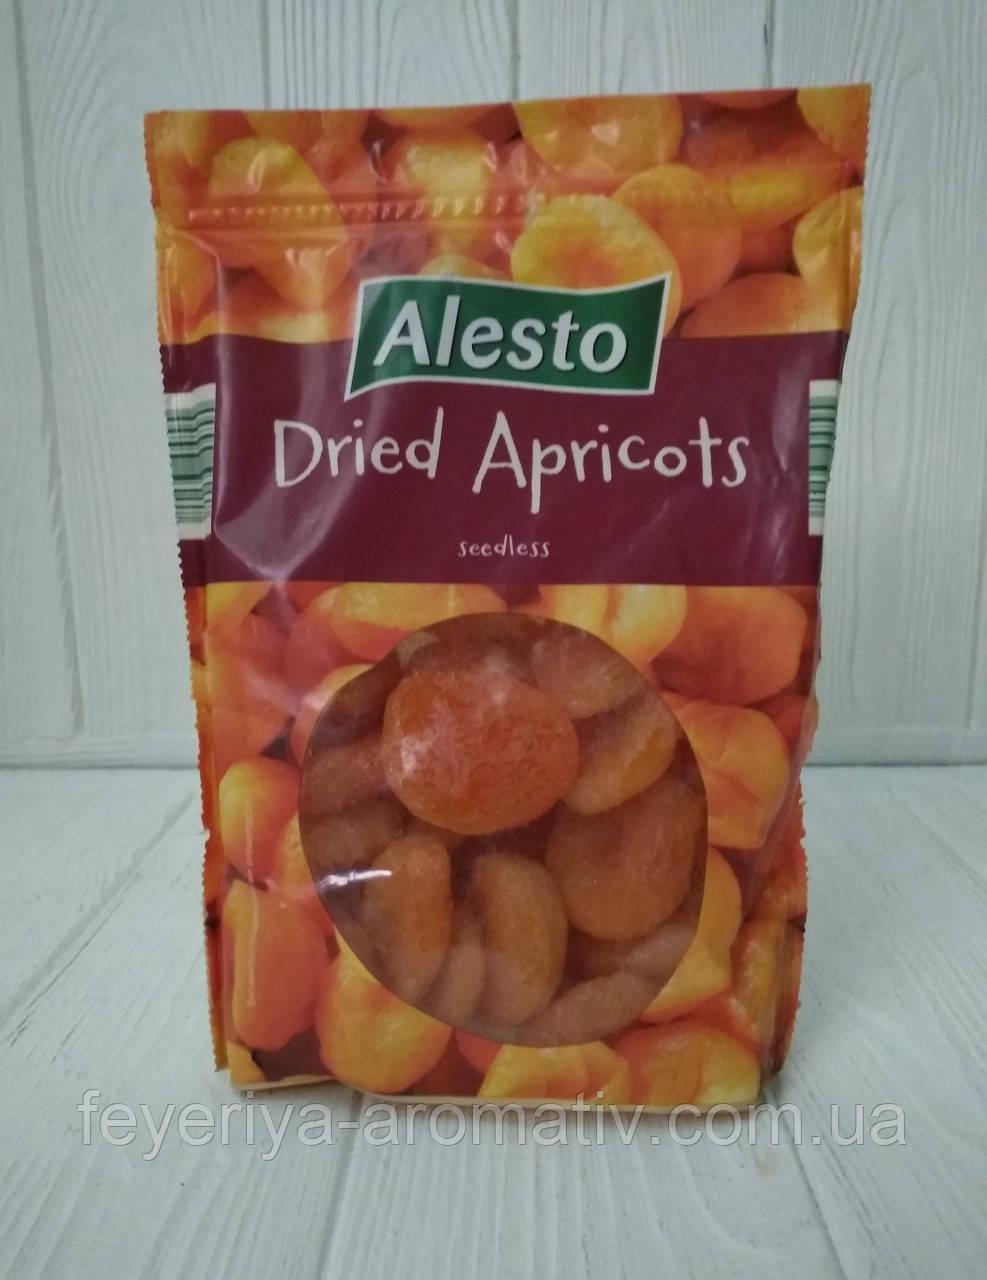 Курага сушеные абрикосы Alesto Dried Apricot 200гр (Франция)